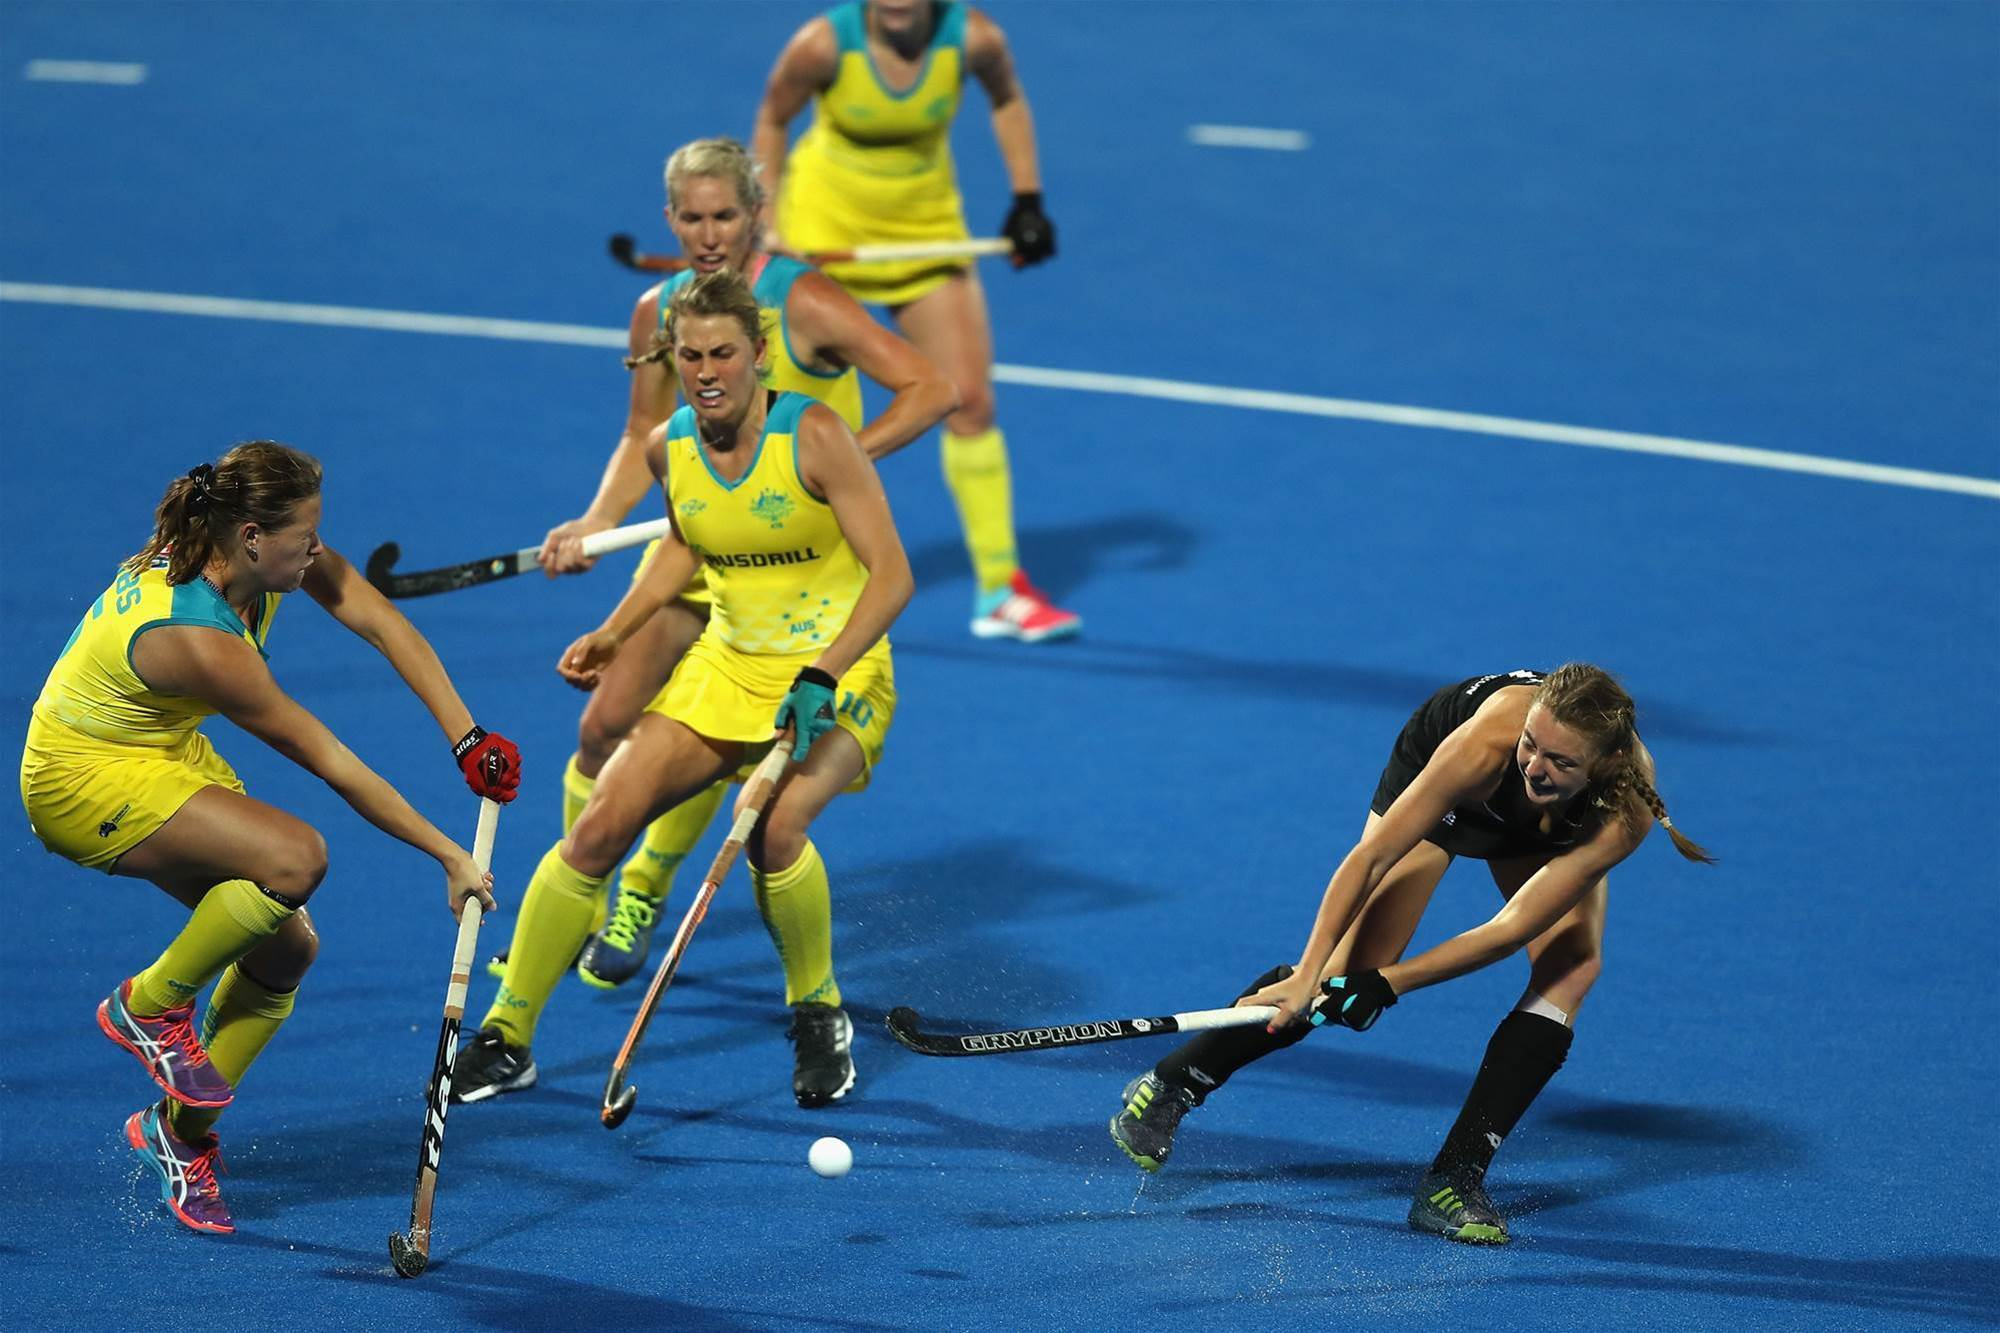 Hockeyroos into Quarter-finals